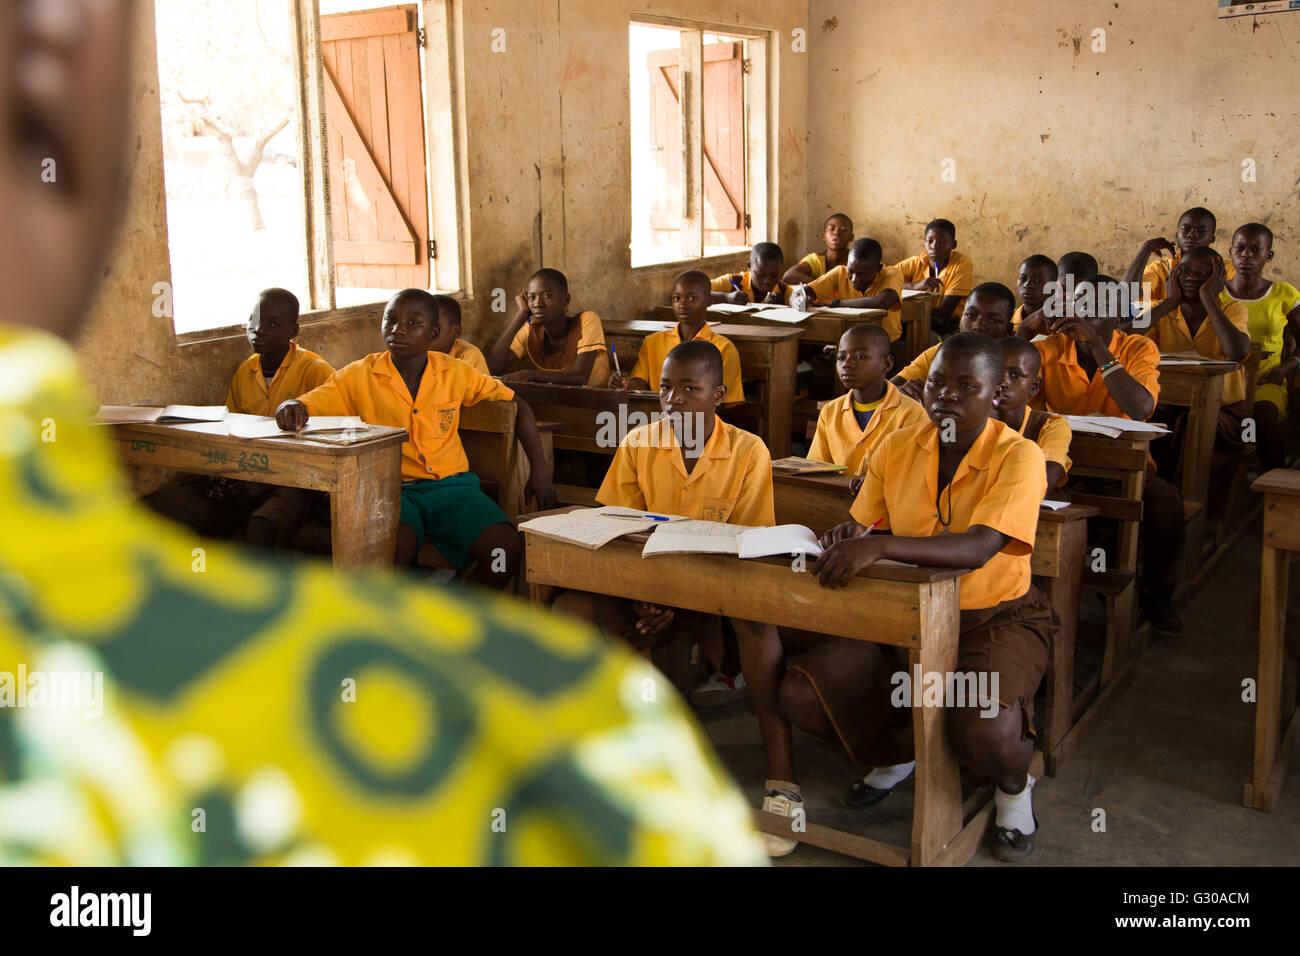 School classroom and teacher, Ghana, West Africa, Africa - Stock Image